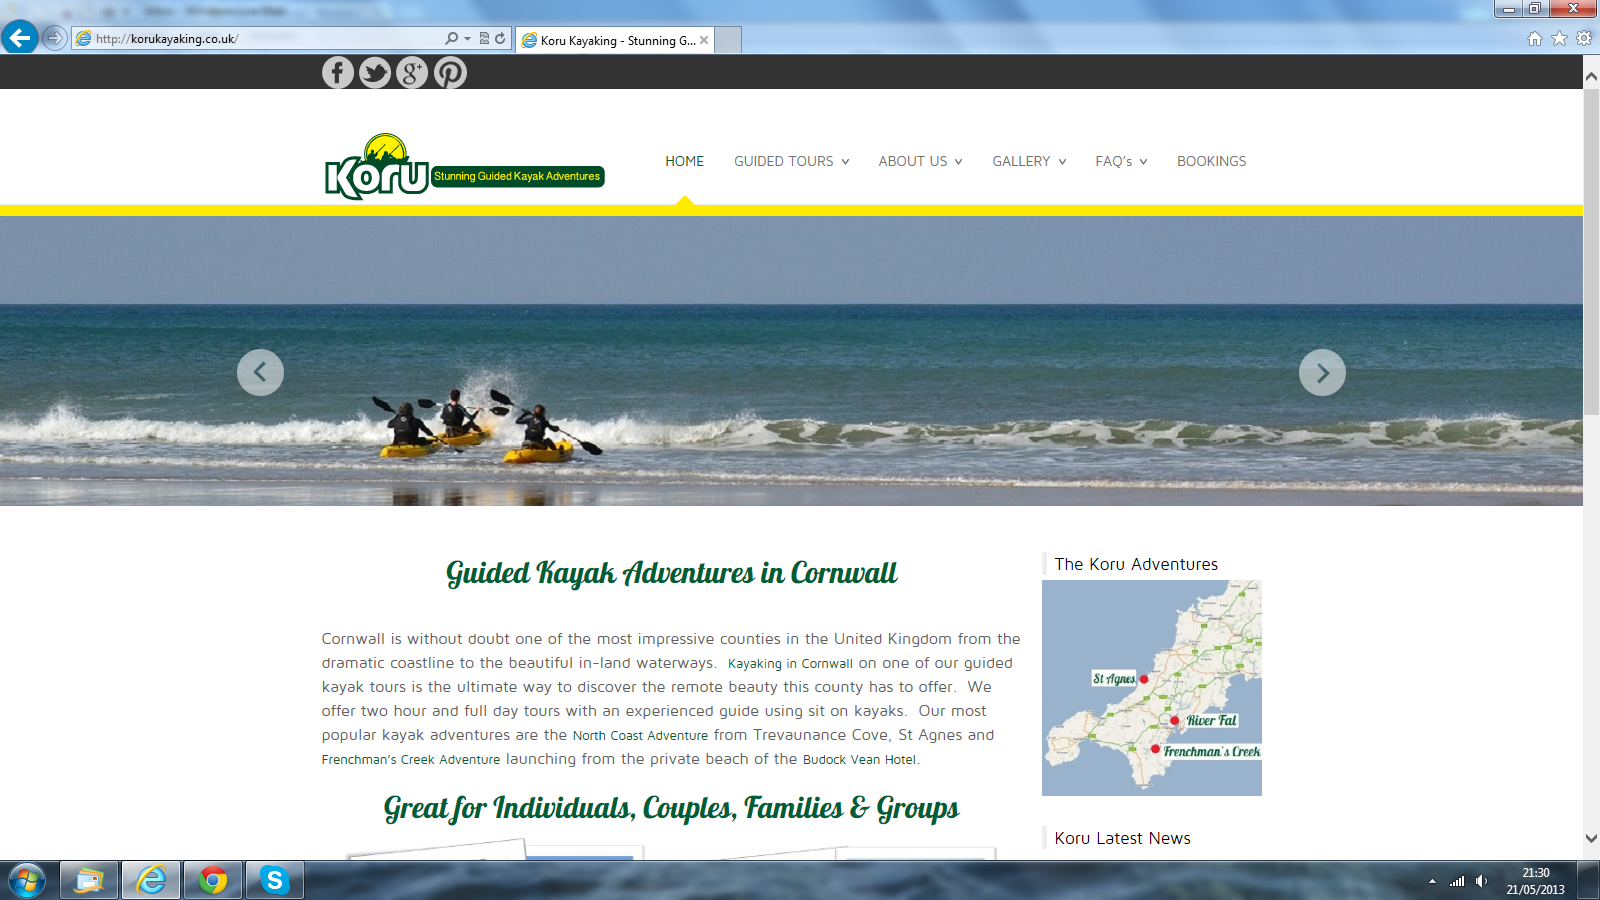 Koru launches new website